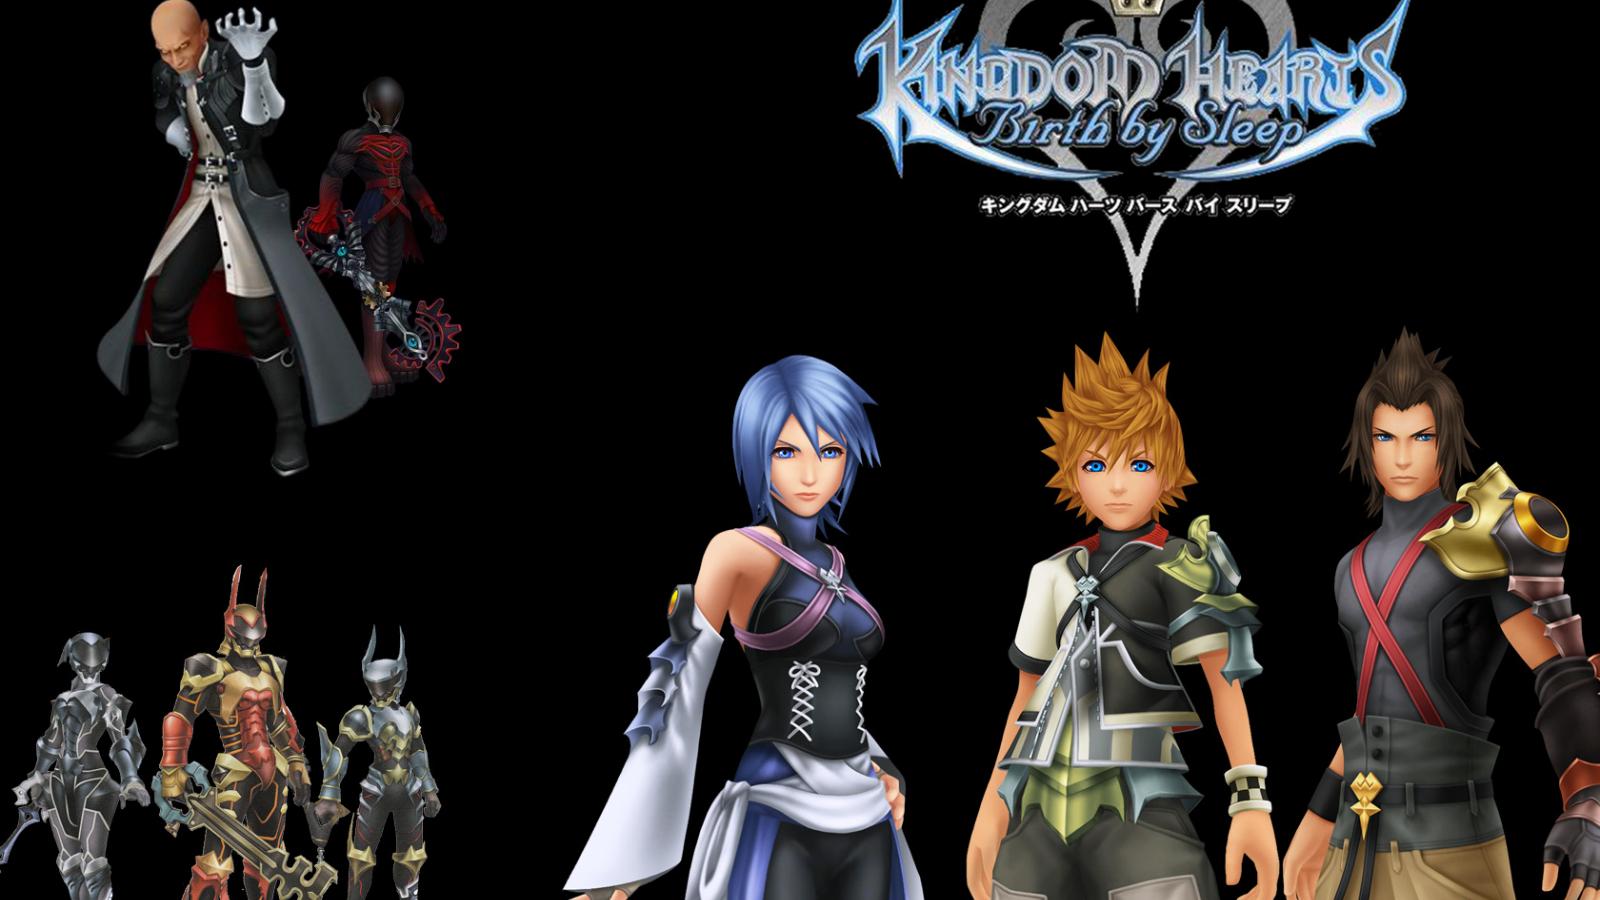 Free Download Kingdom Hearts 3 Wallpaper For Desktop 1680x1050